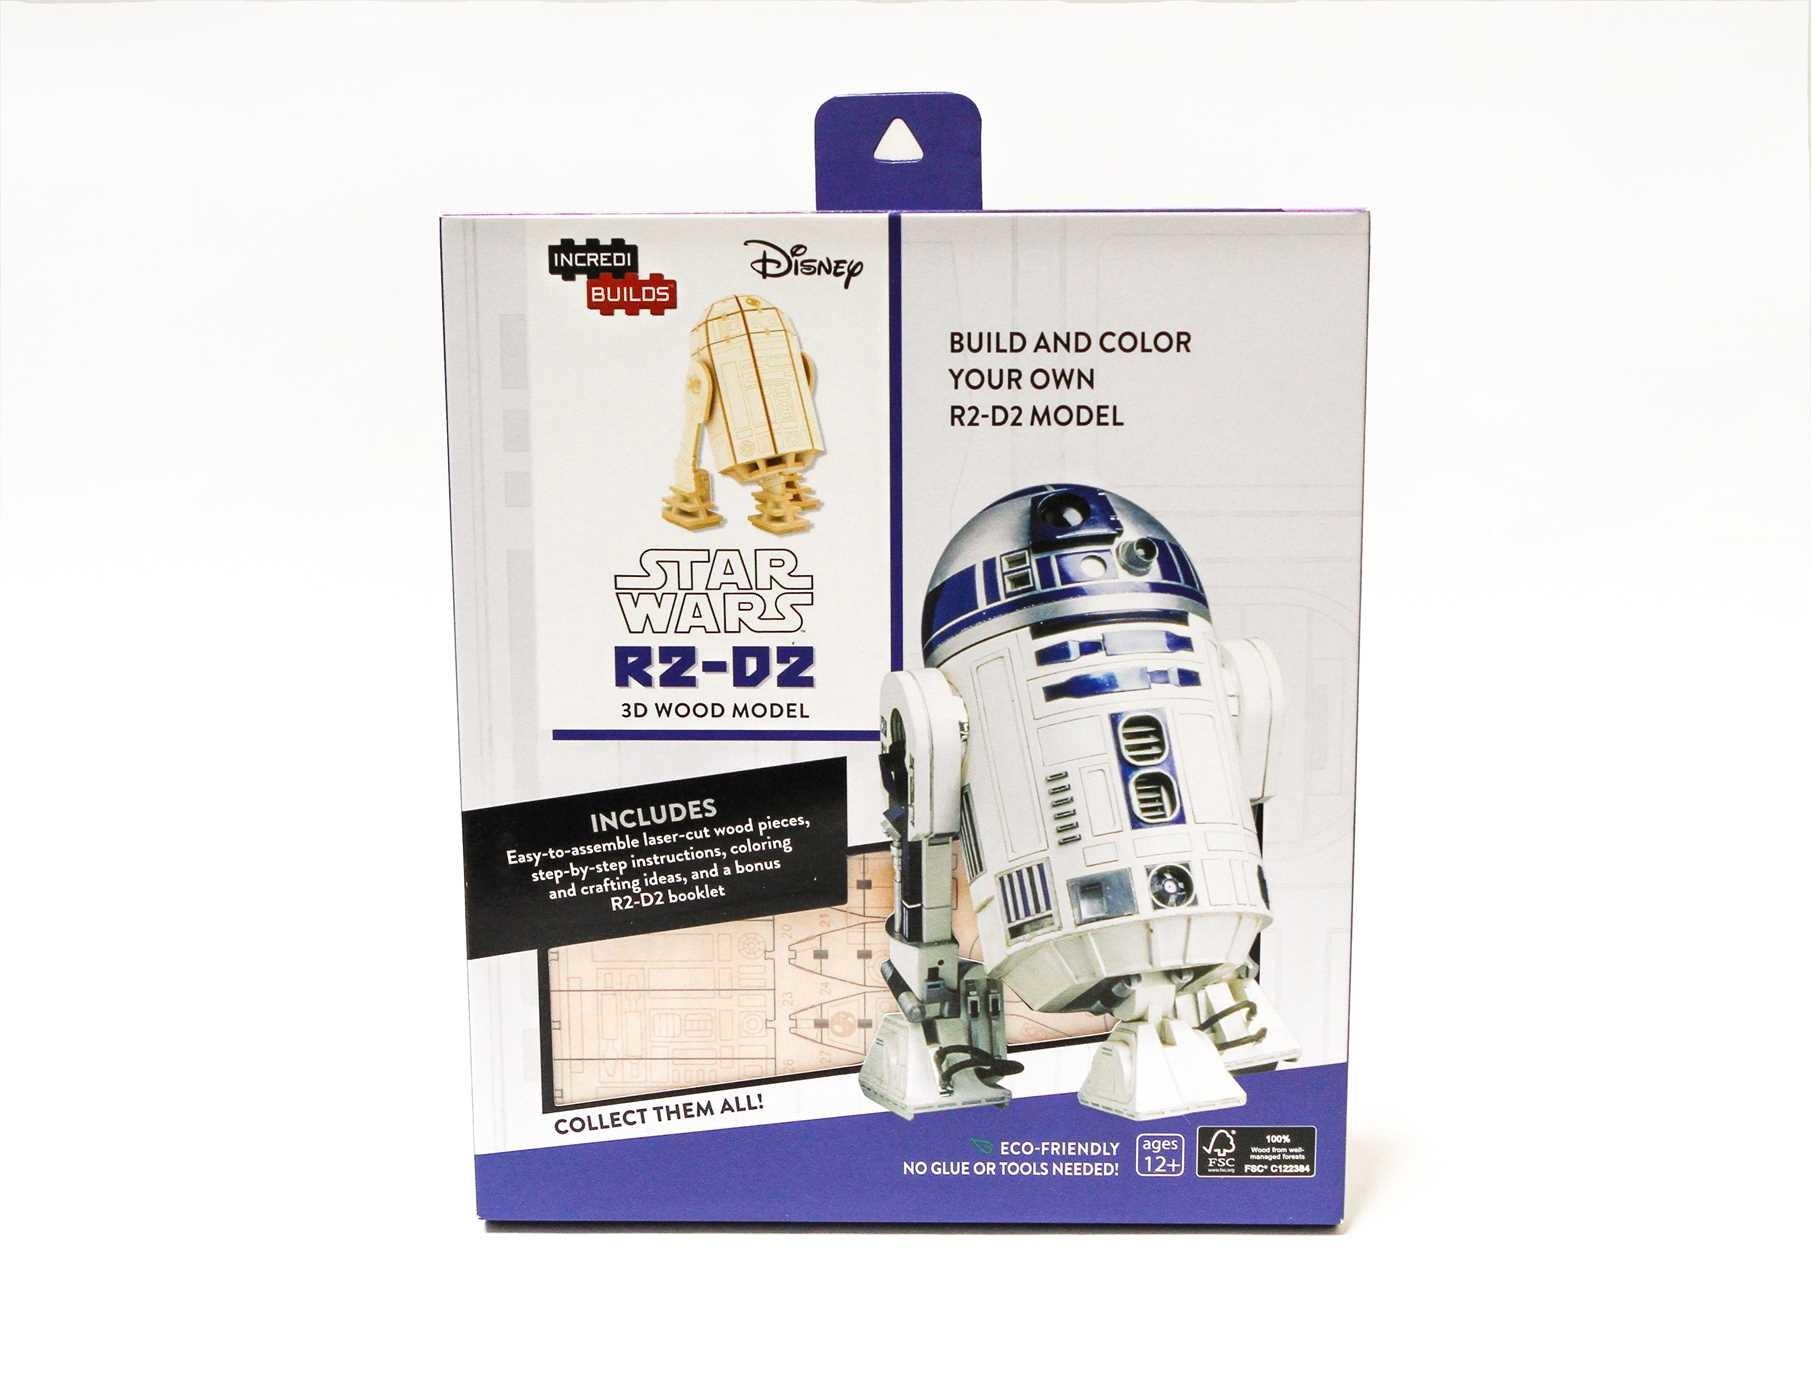 Incredibuilds star wars r2 d2 3d wood model 9781682980279.in02